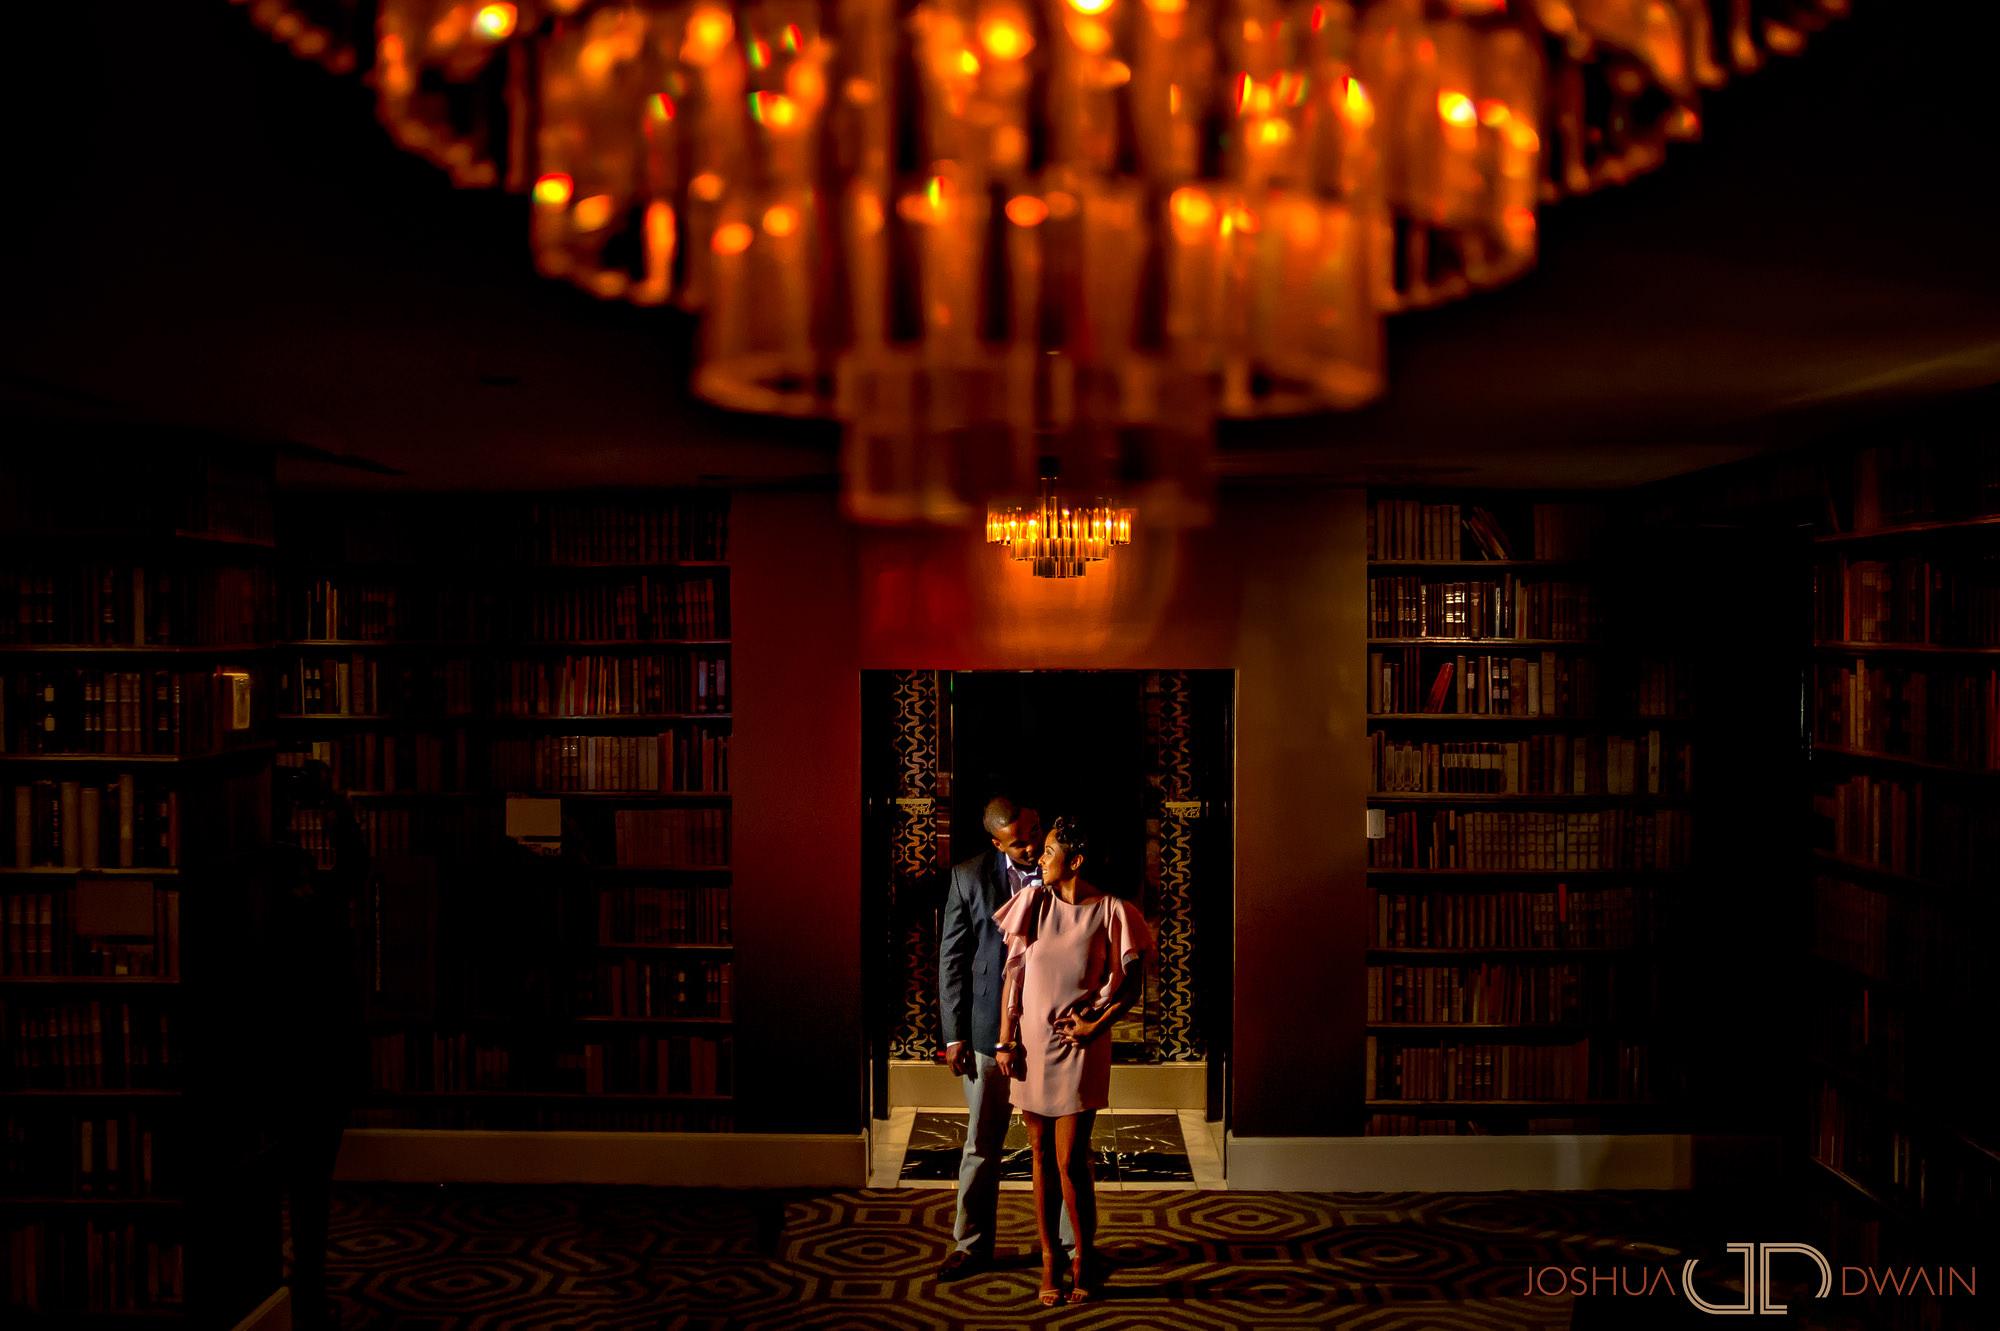 monique-lloyd-005-washington-dc-engagement-photographer-joshua-dwain